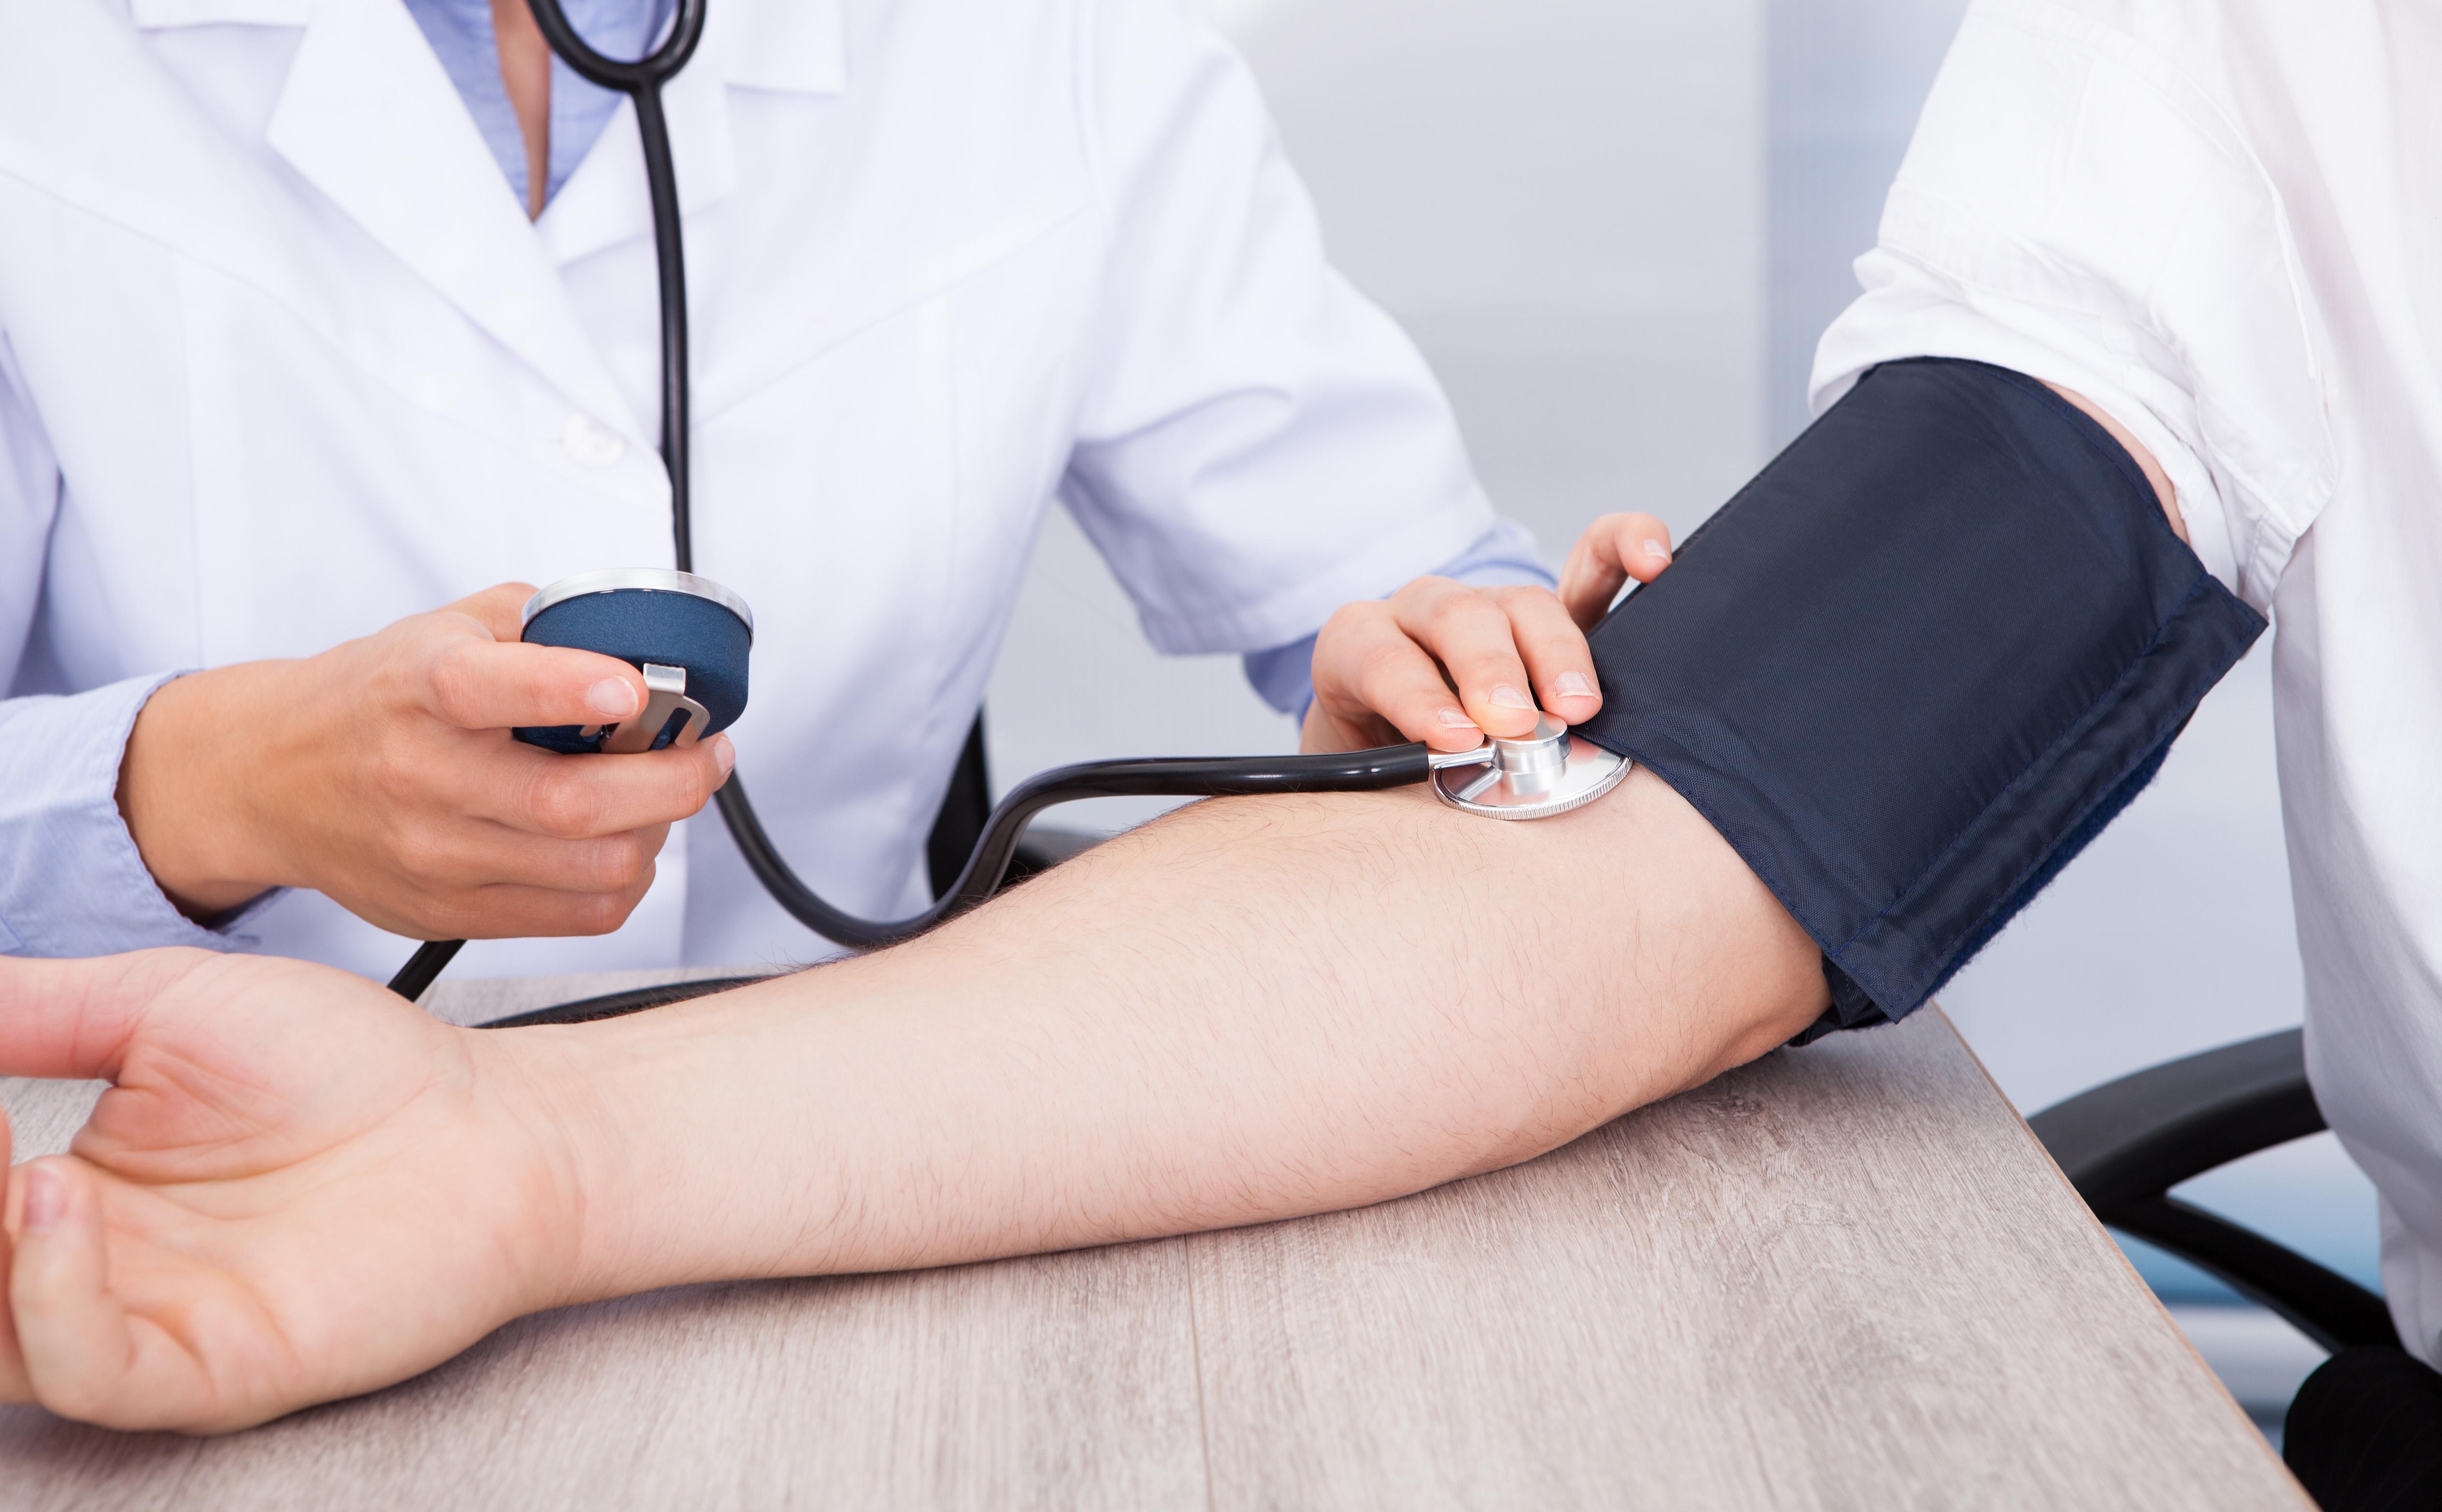 magas vérnyomásban szenved magas vérnyomás adrenalin